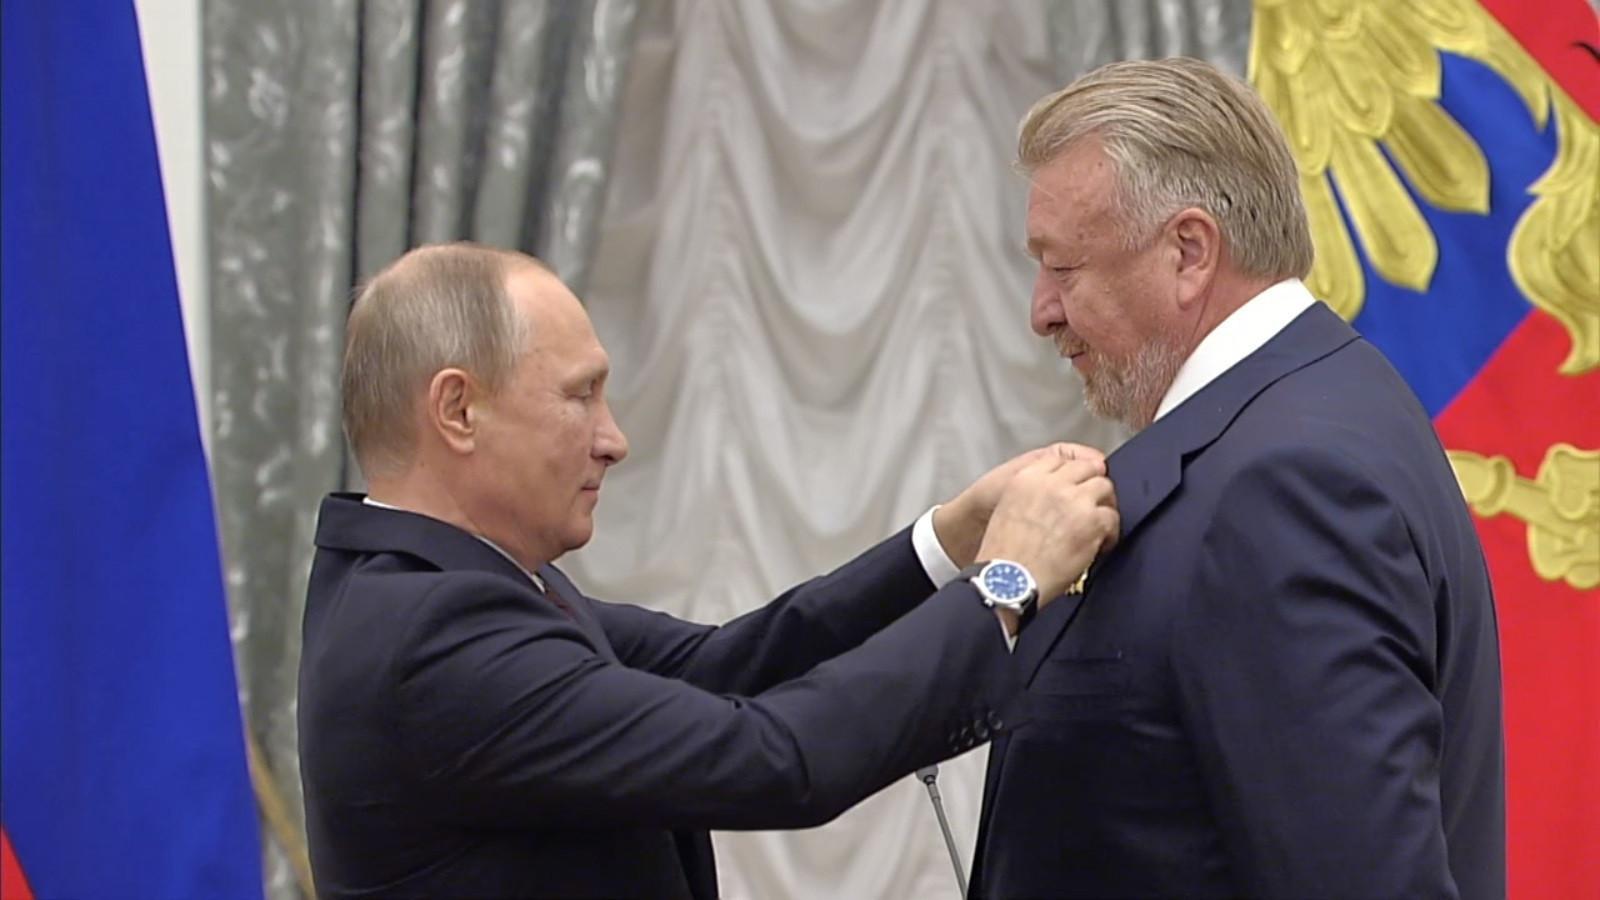 Vasily Titov receives the Order of Friendship from Russian President Vladimir Putin in 2017 ©Russian Gymnastics Federation